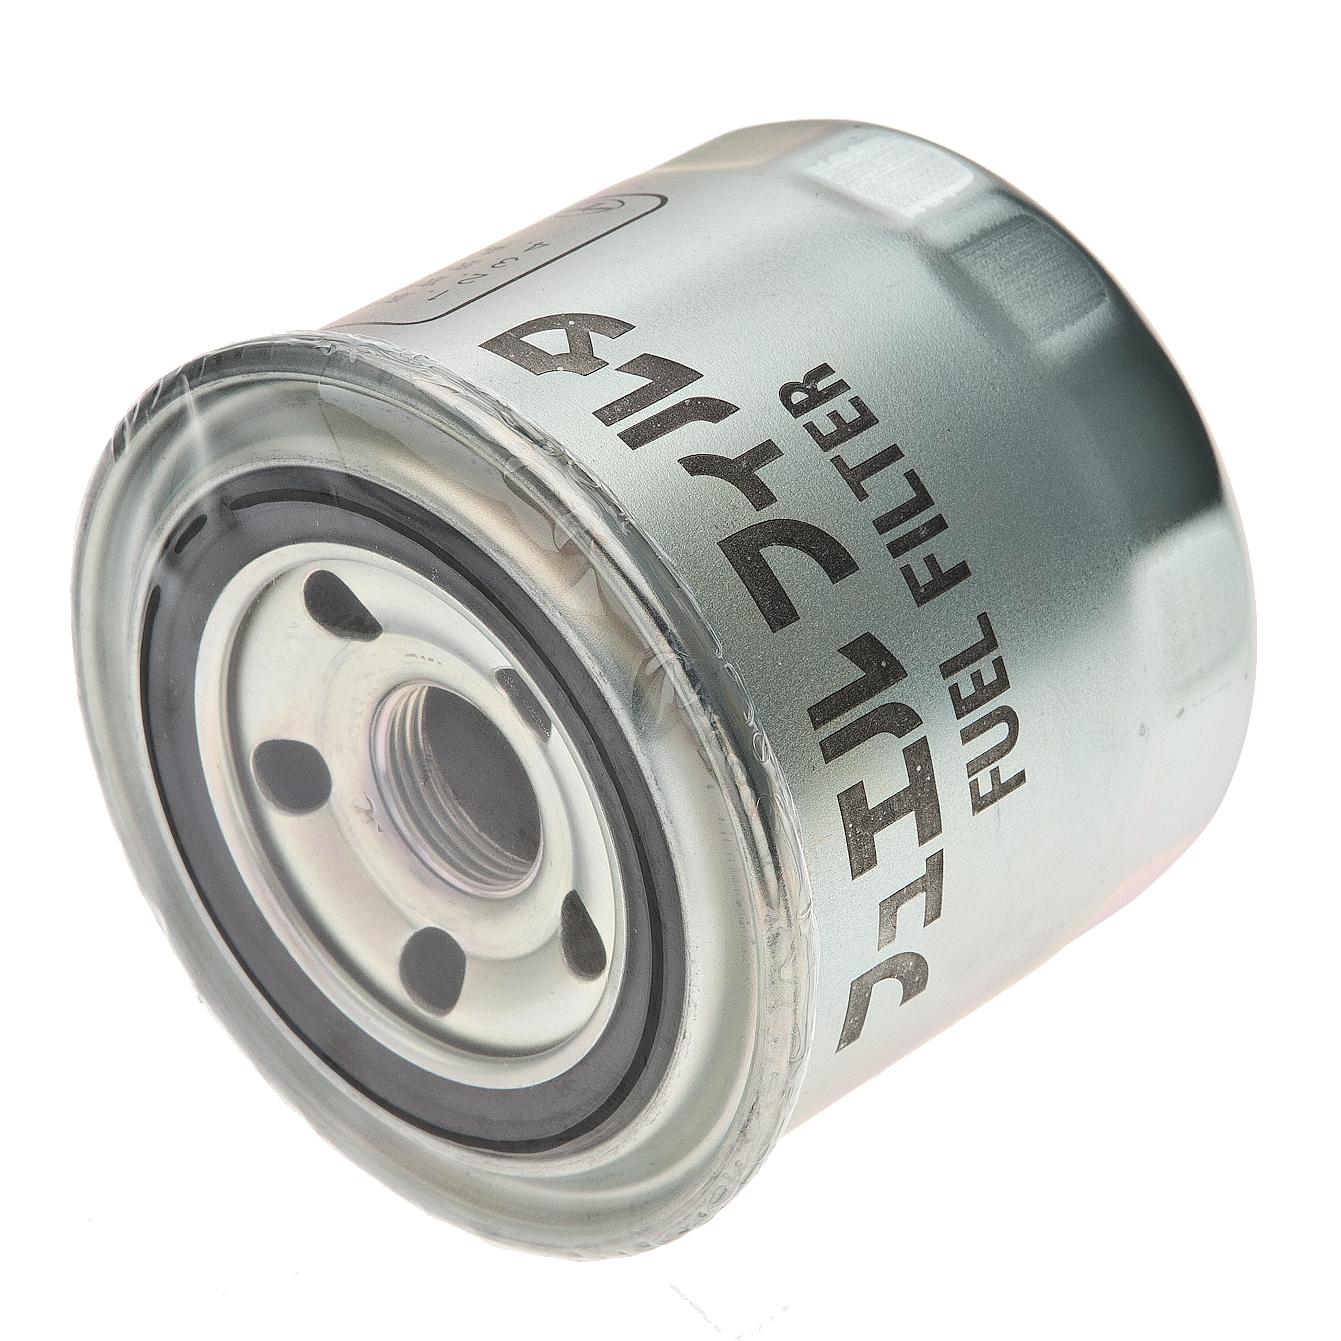 Kubota Fuel Filter 15221 43170 Coleman Equipment Location